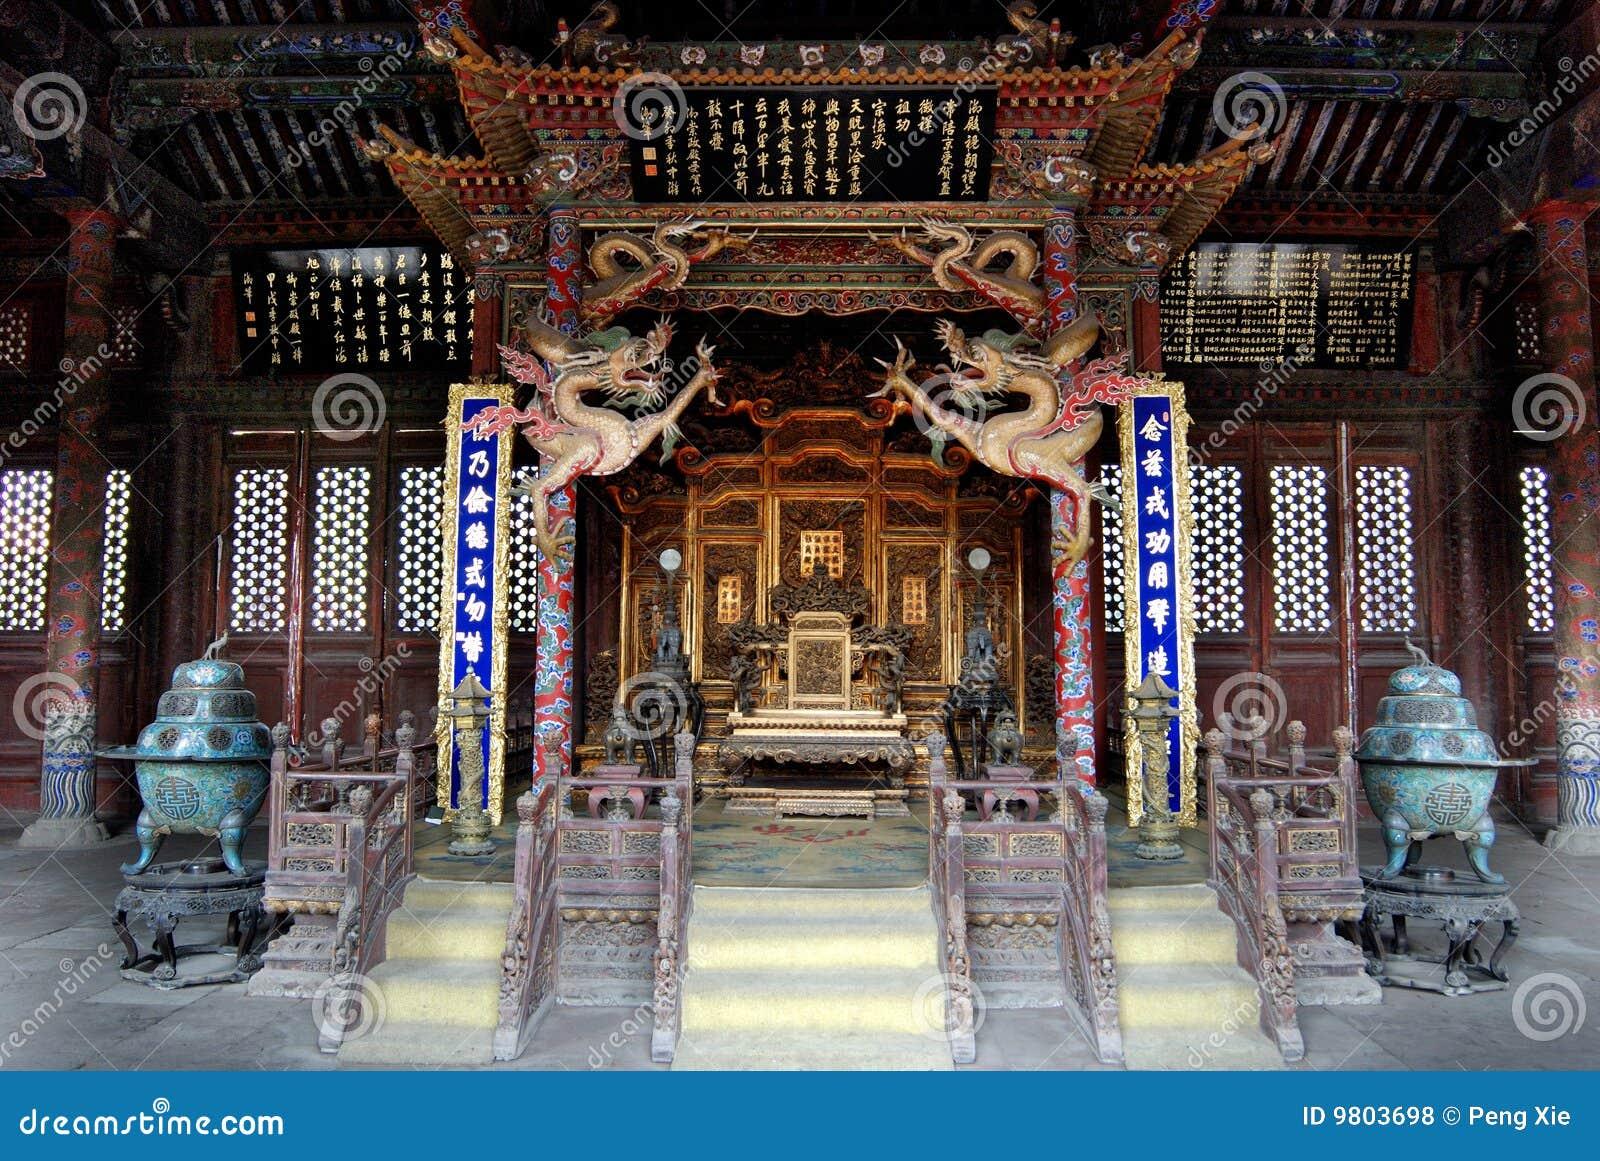 Qing Dynasty Palace Chongzheng Palace Inside Royalty Free